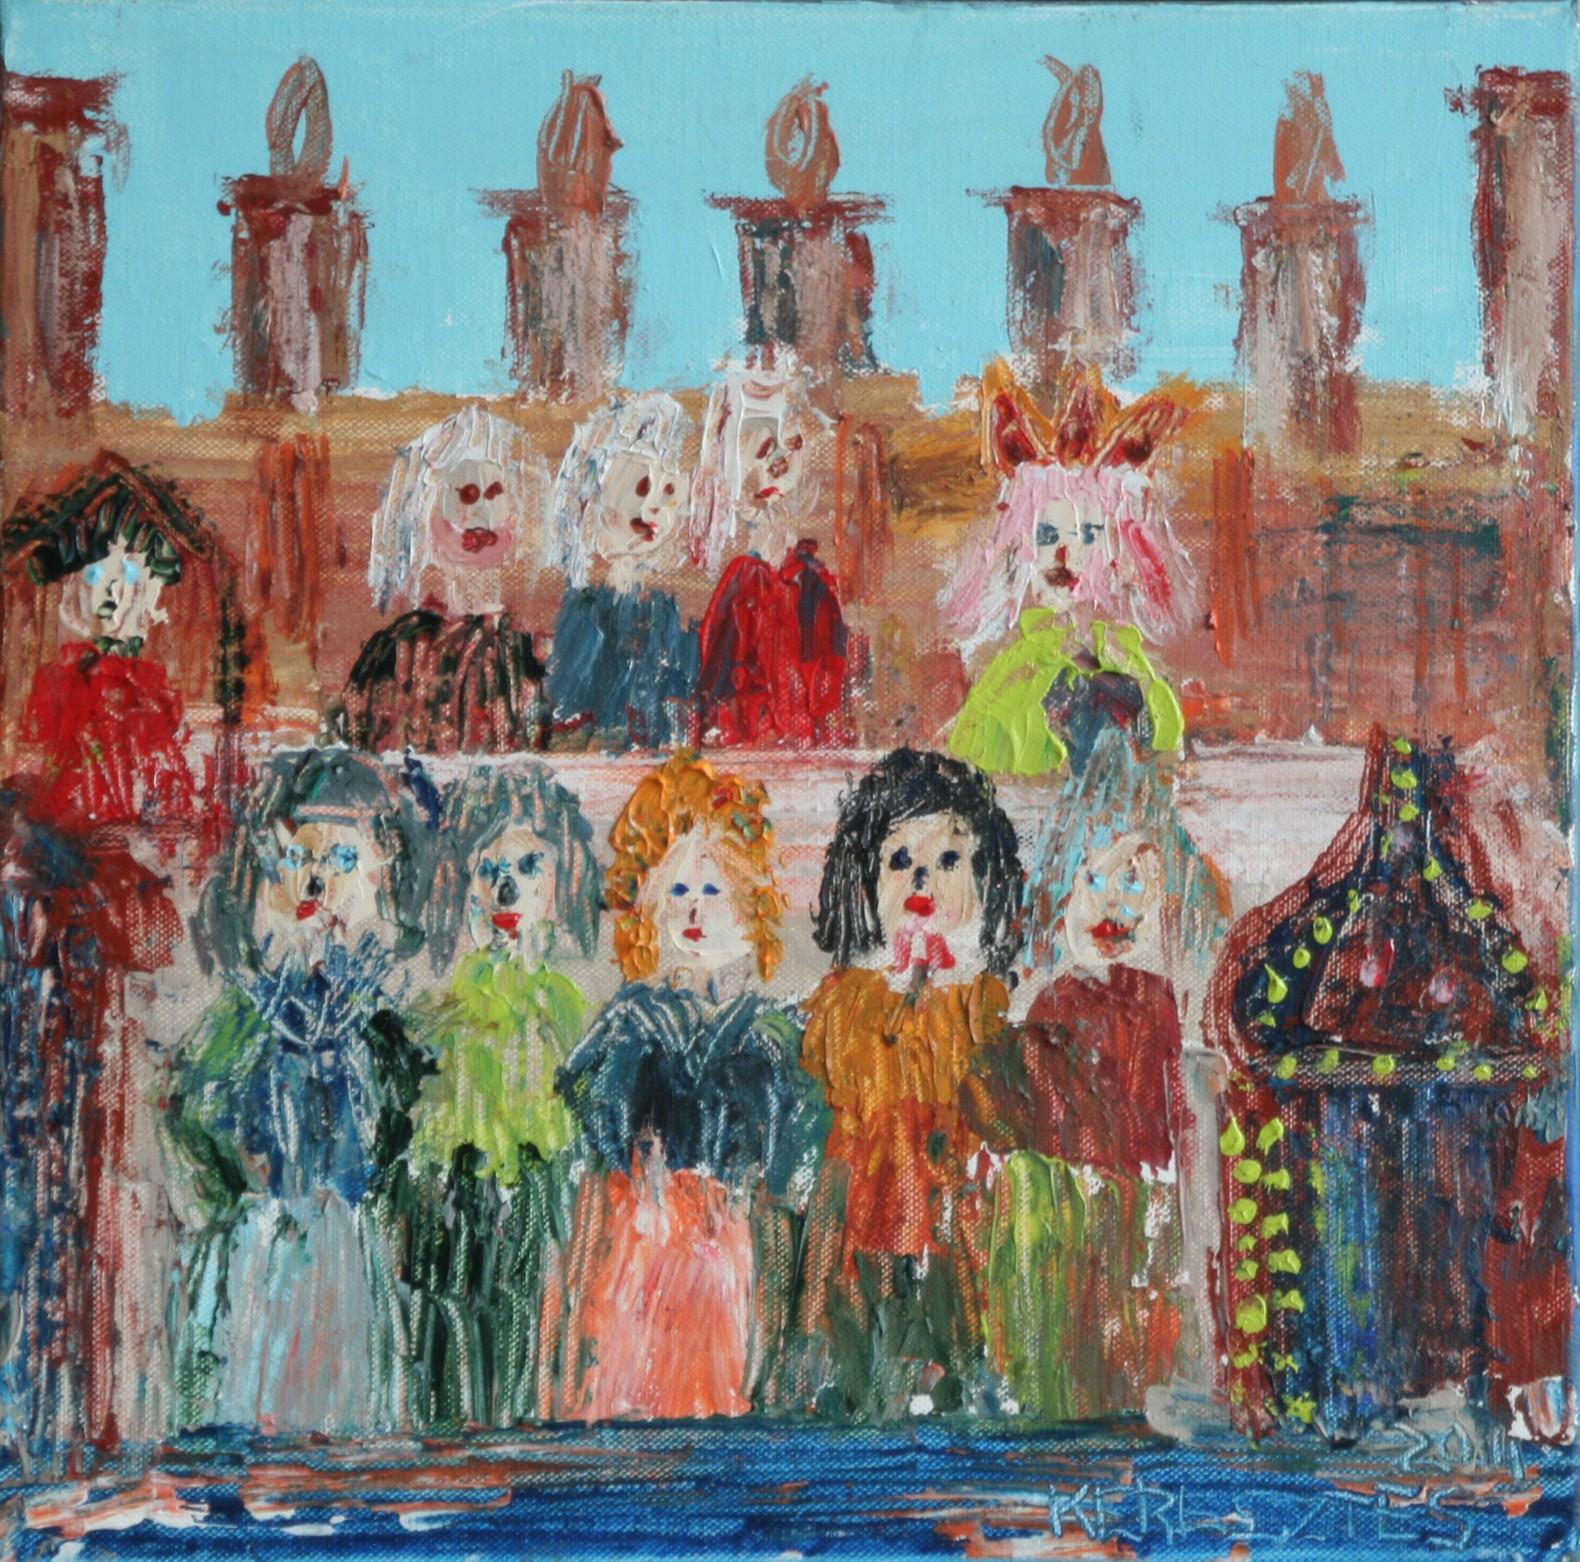 toile 1 - magdalena keresztes, artiste peintre à amiens